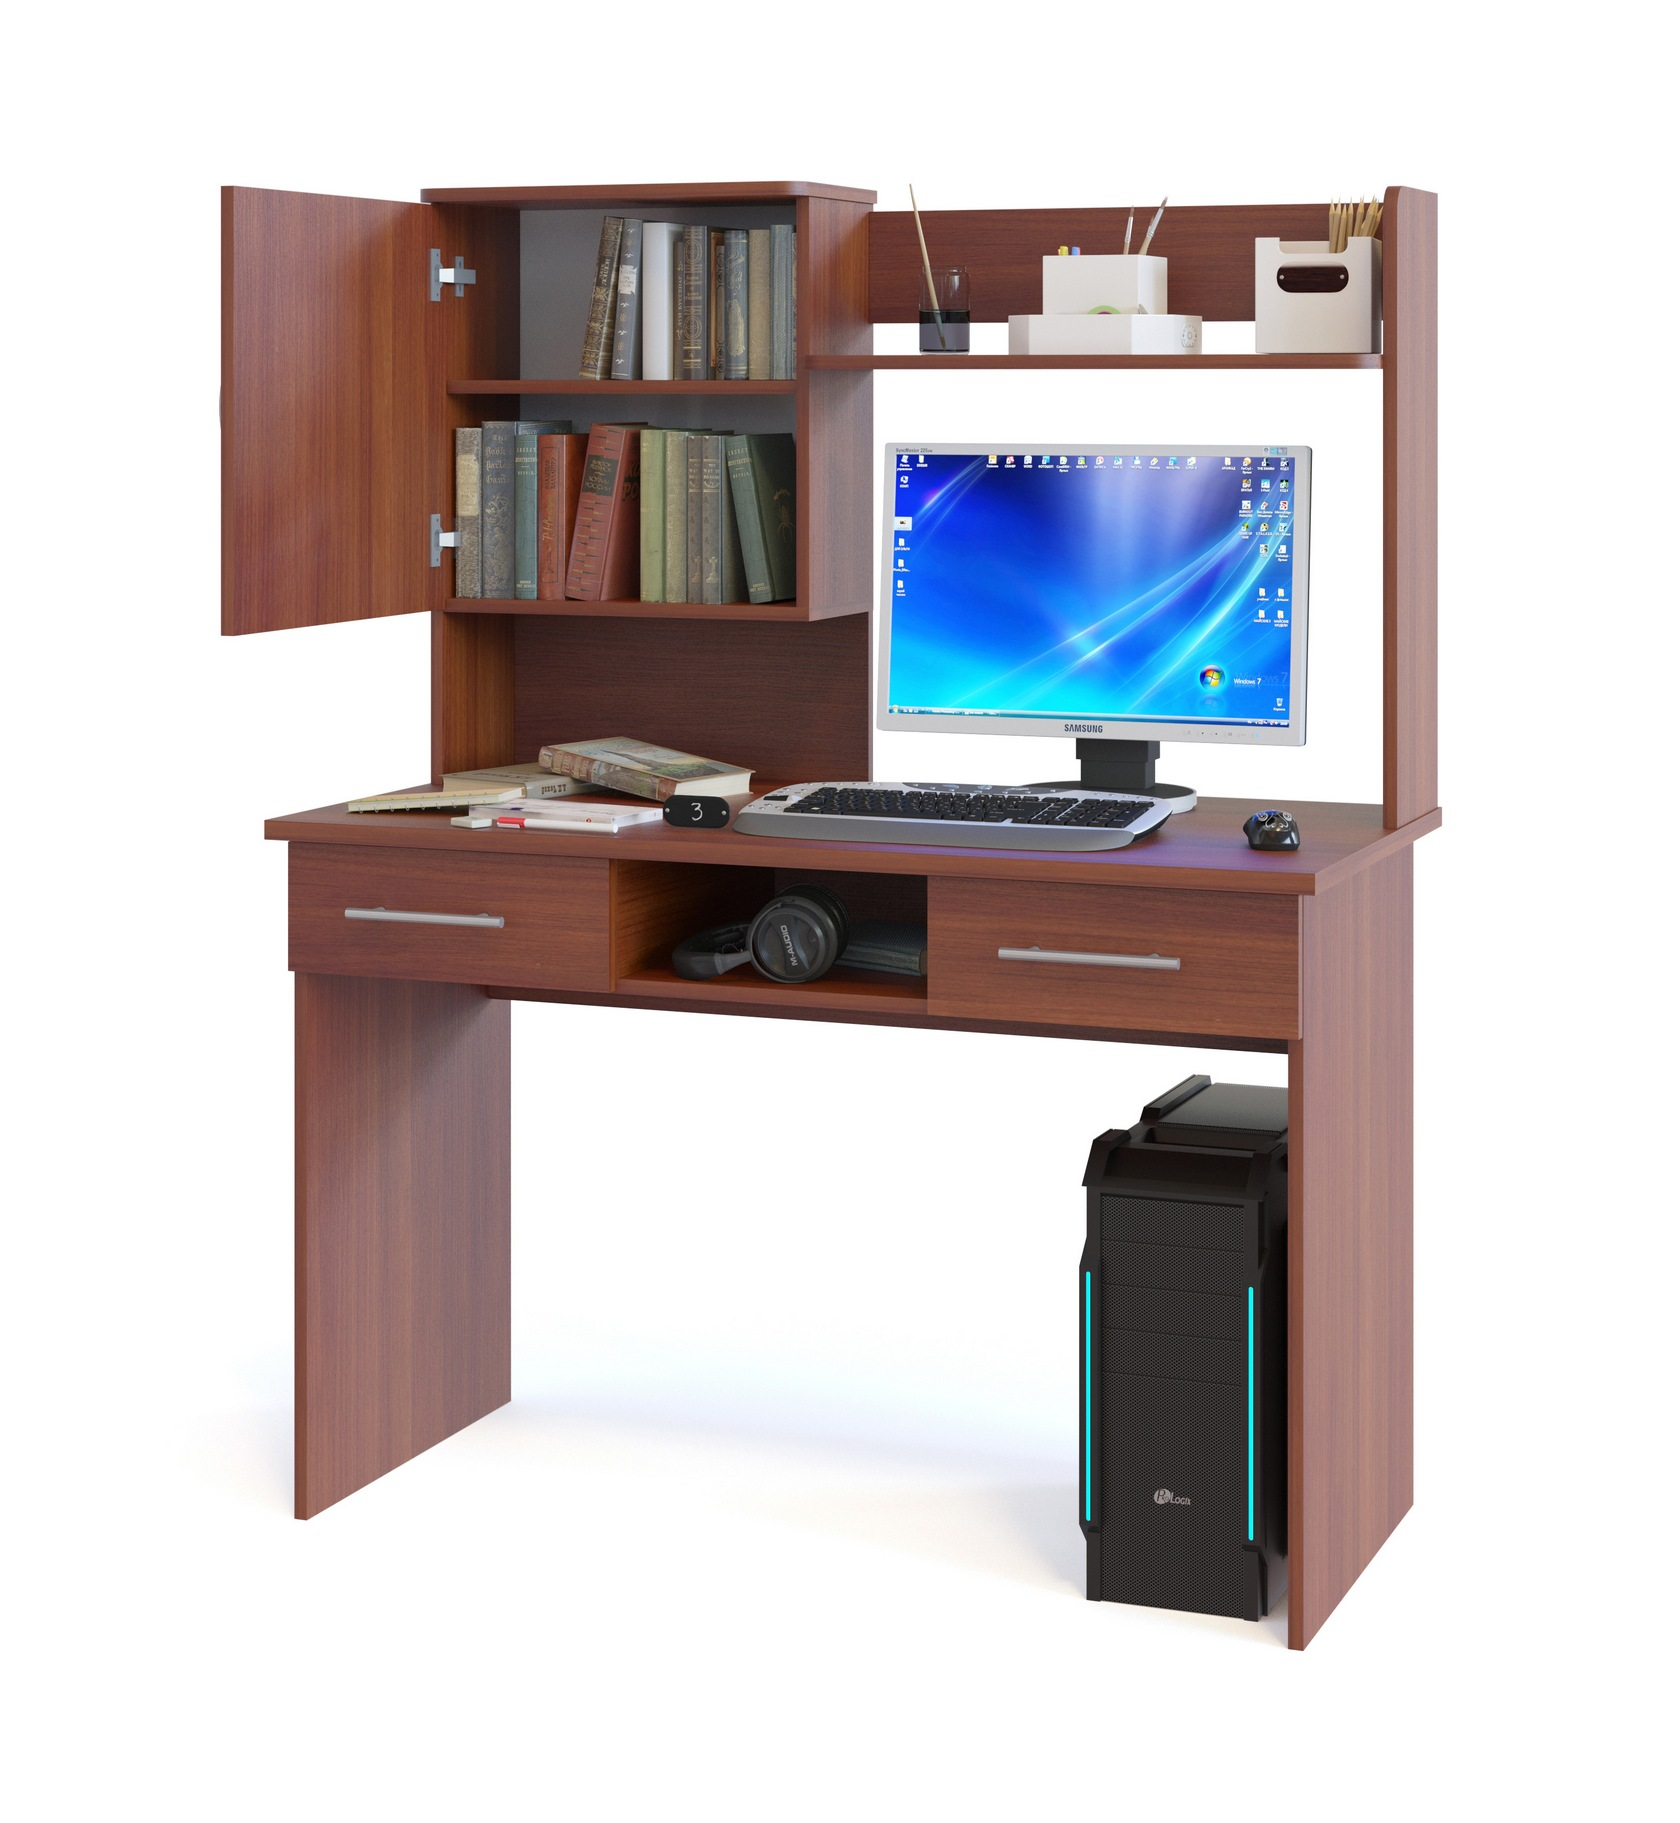 Компьютерный стол Сокол КСТ-107.1+КН-24